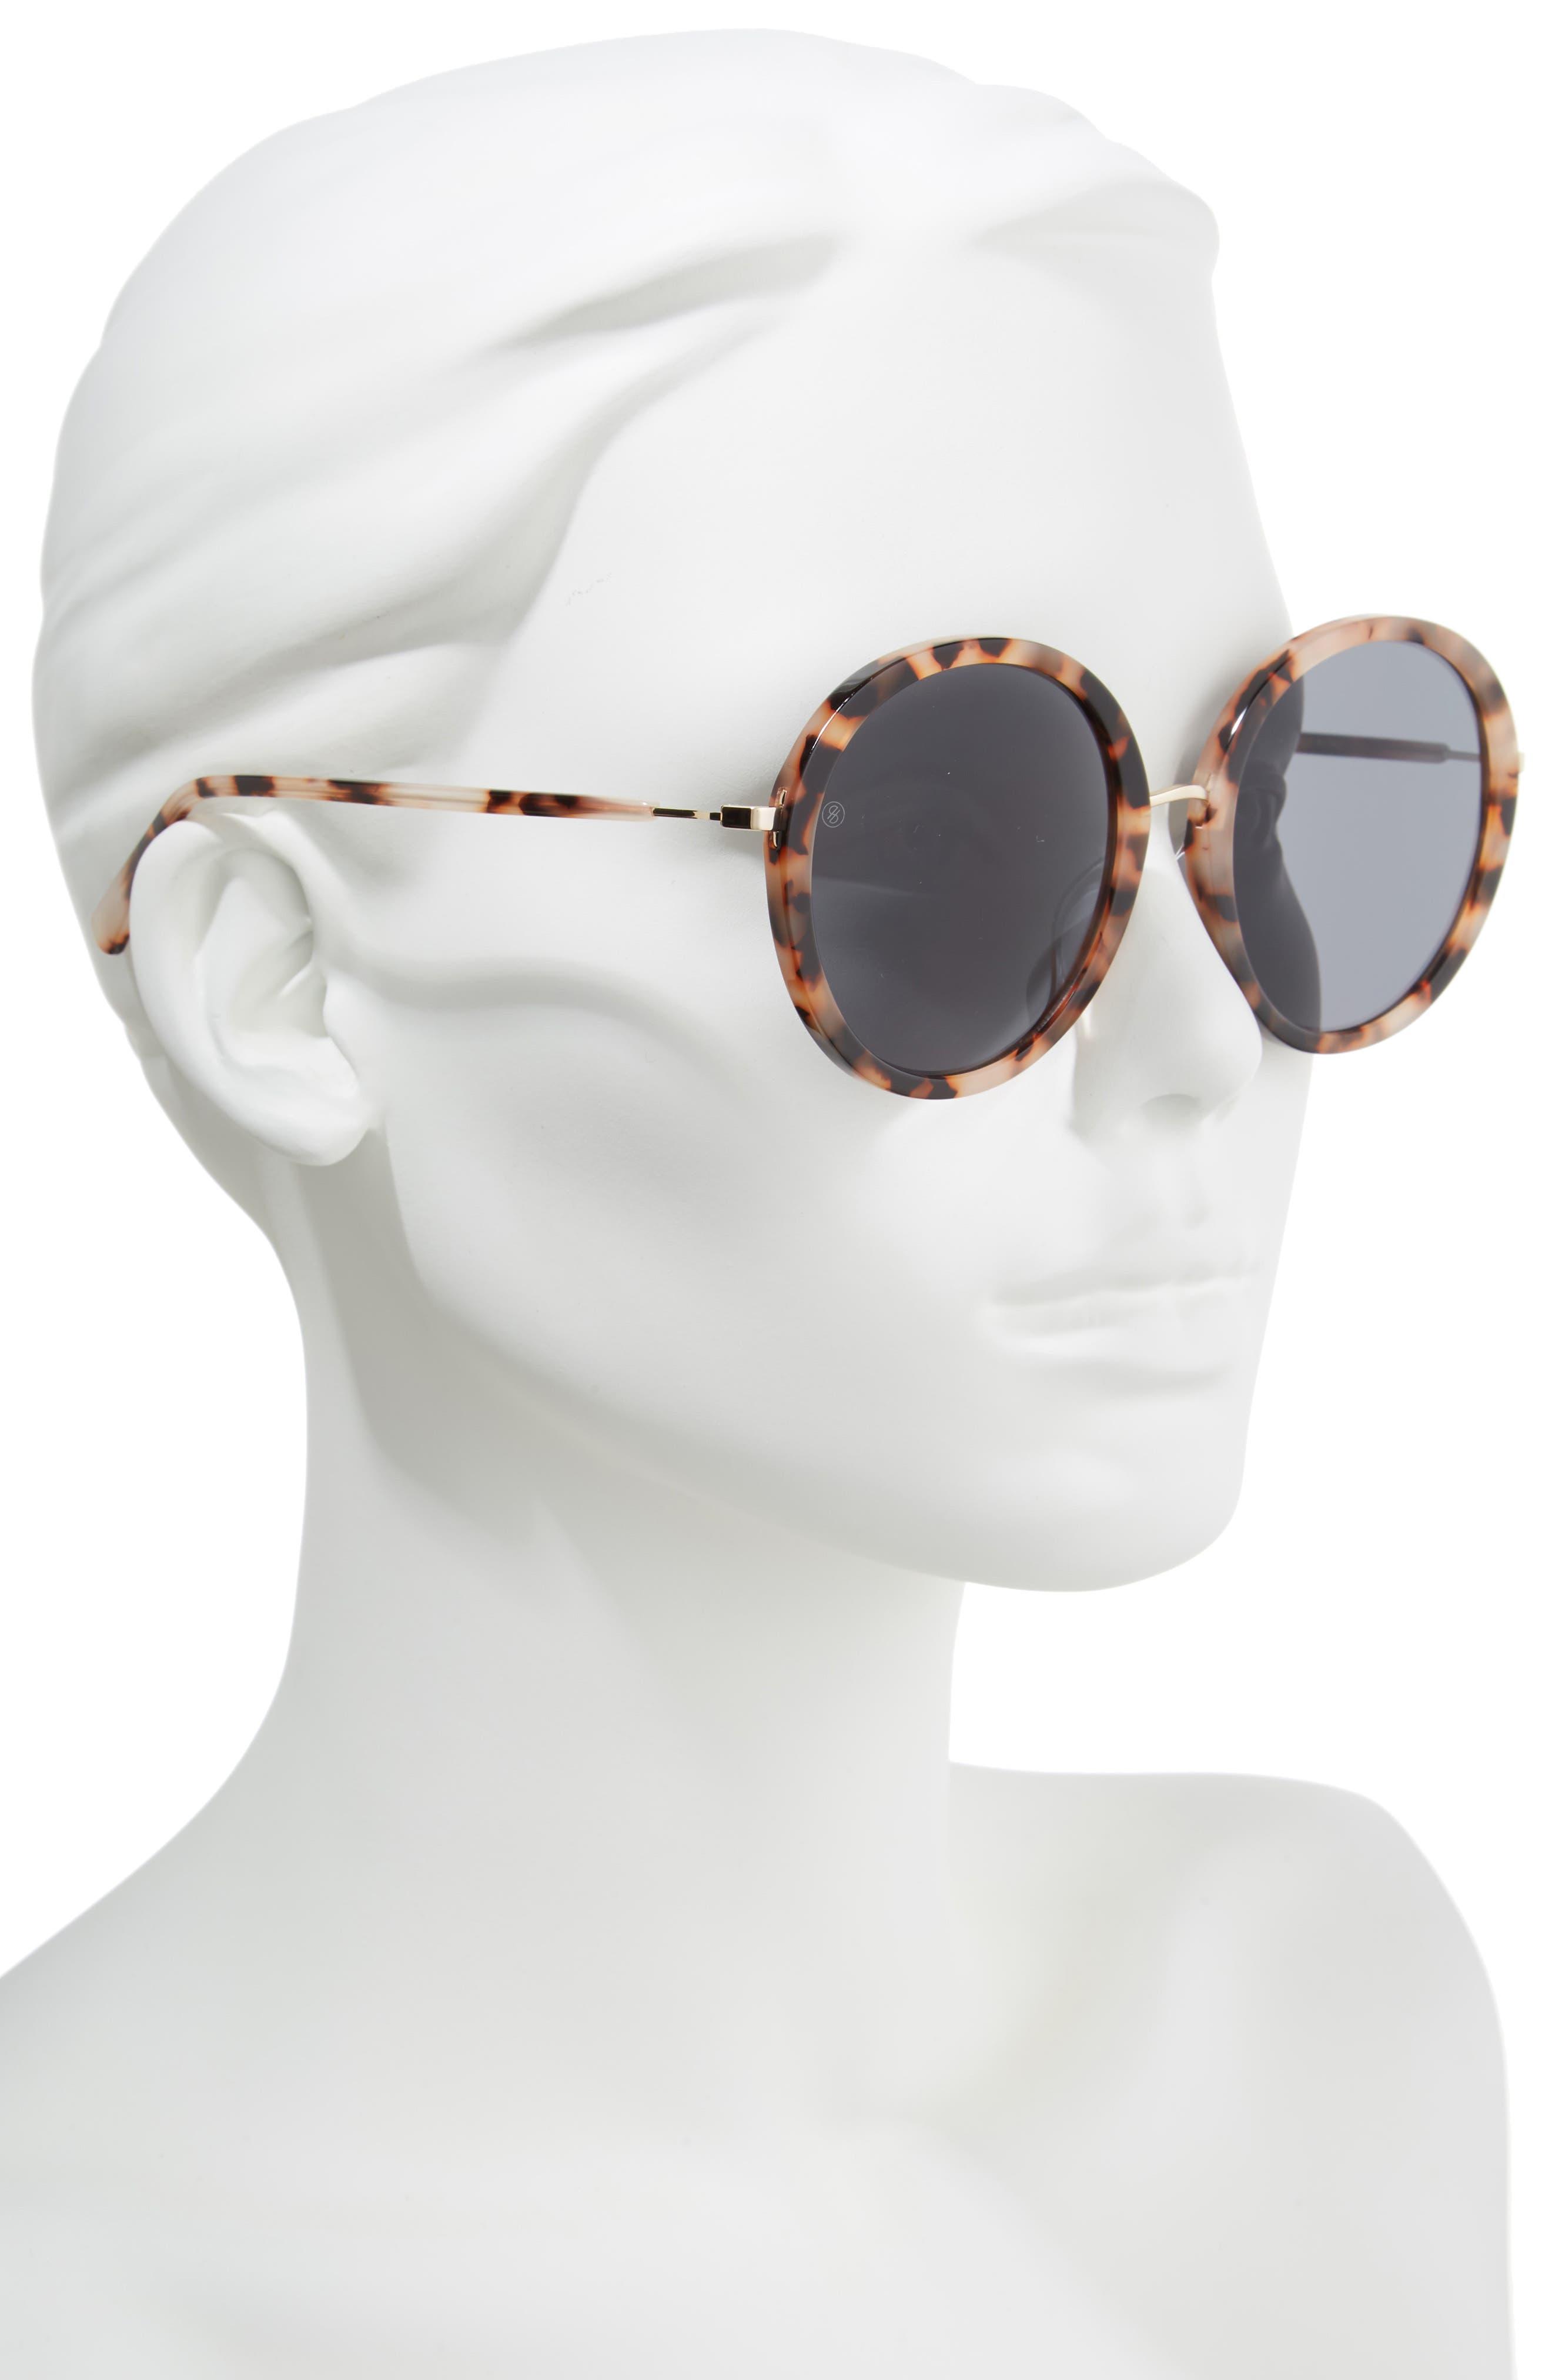 D'BLANC Prose 56mm Round Sunglasses,                             Alternate thumbnail 2, color,                             200